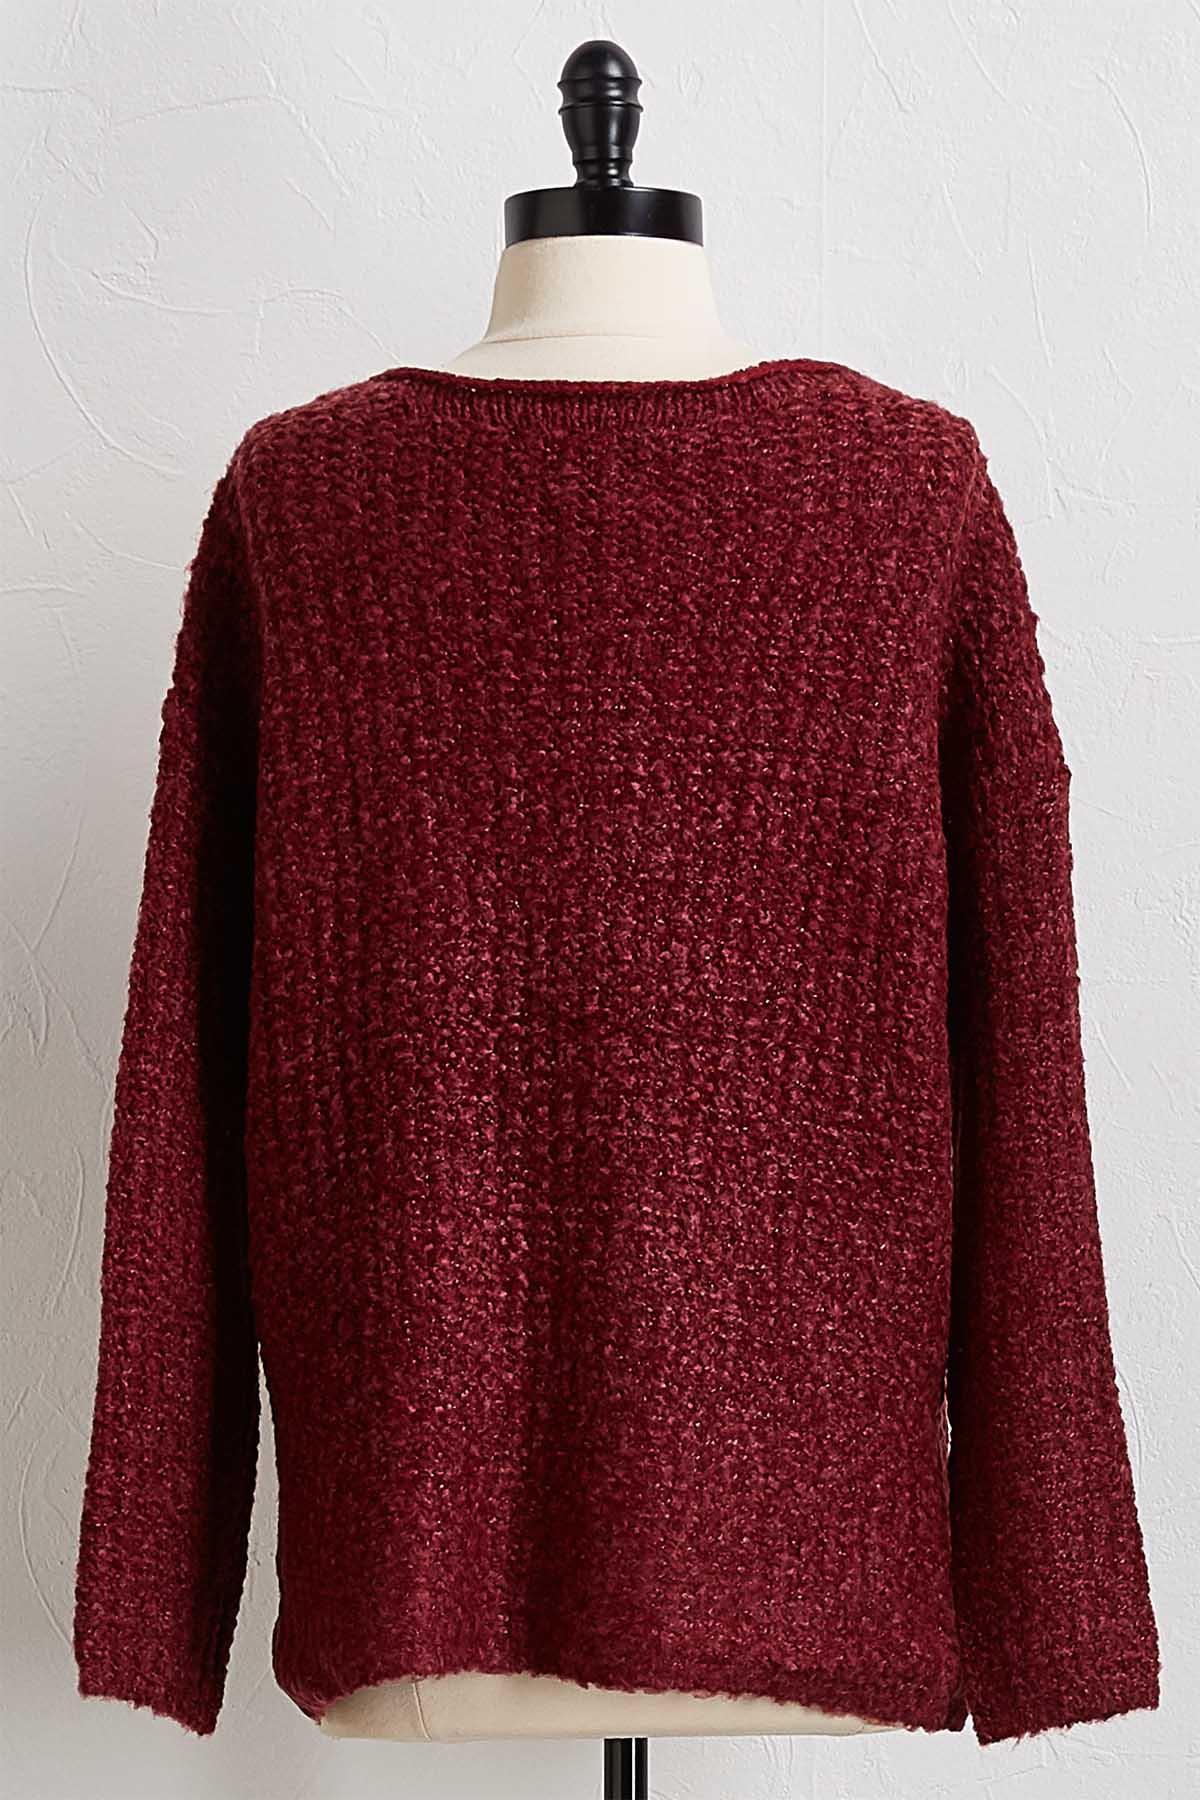 Wine Pullover Sweater